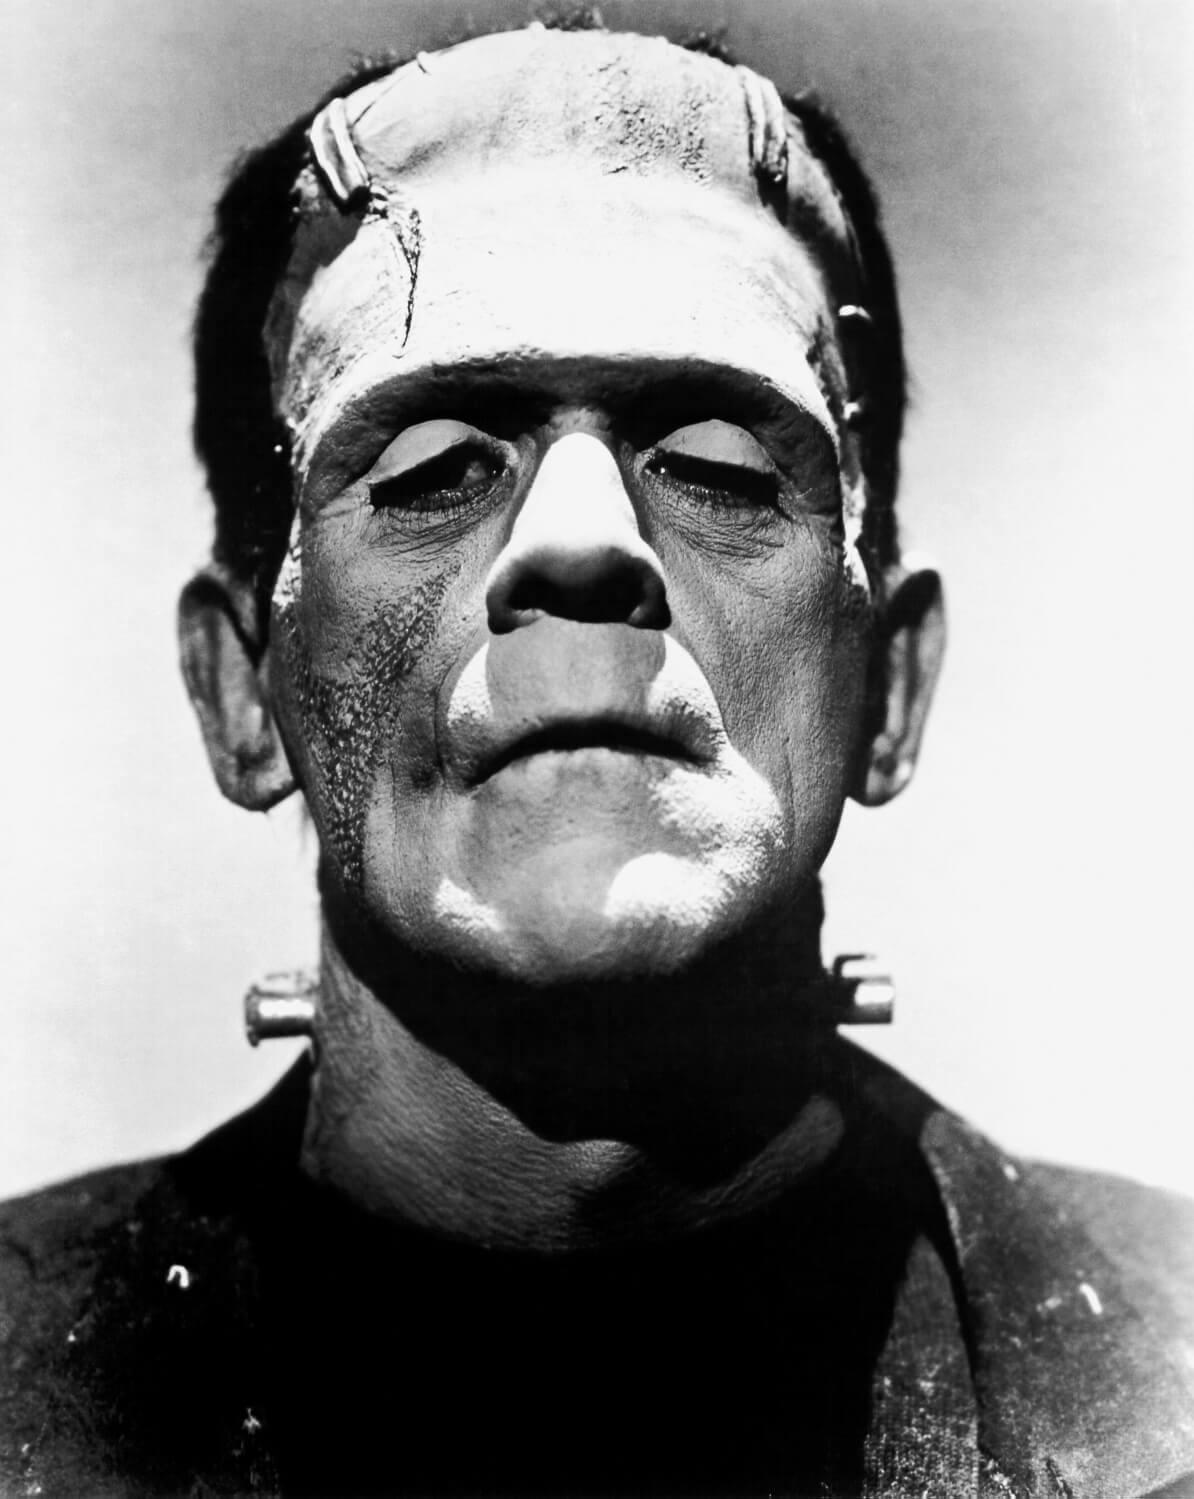 frankensteins_monster_boris_karloff-wikimedia-public-domain